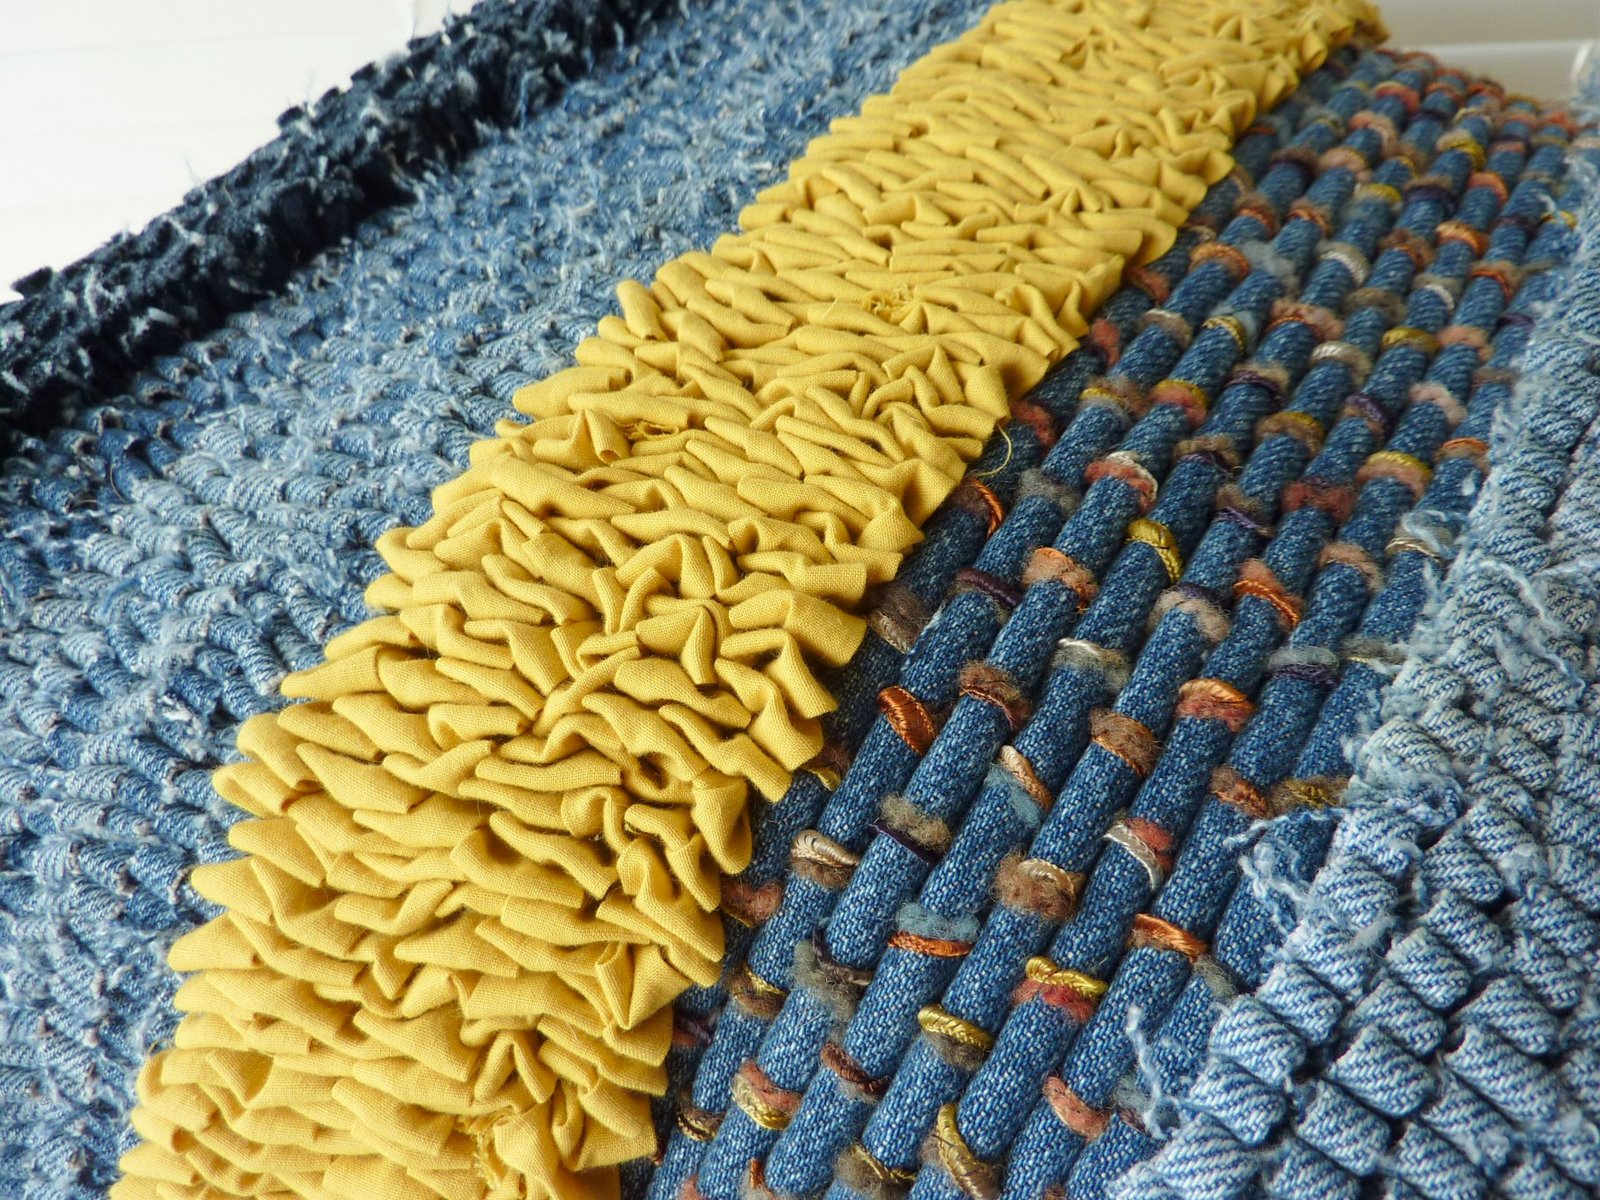 Fire Horse Textiles Rag Rug Recycled Denim Cushion